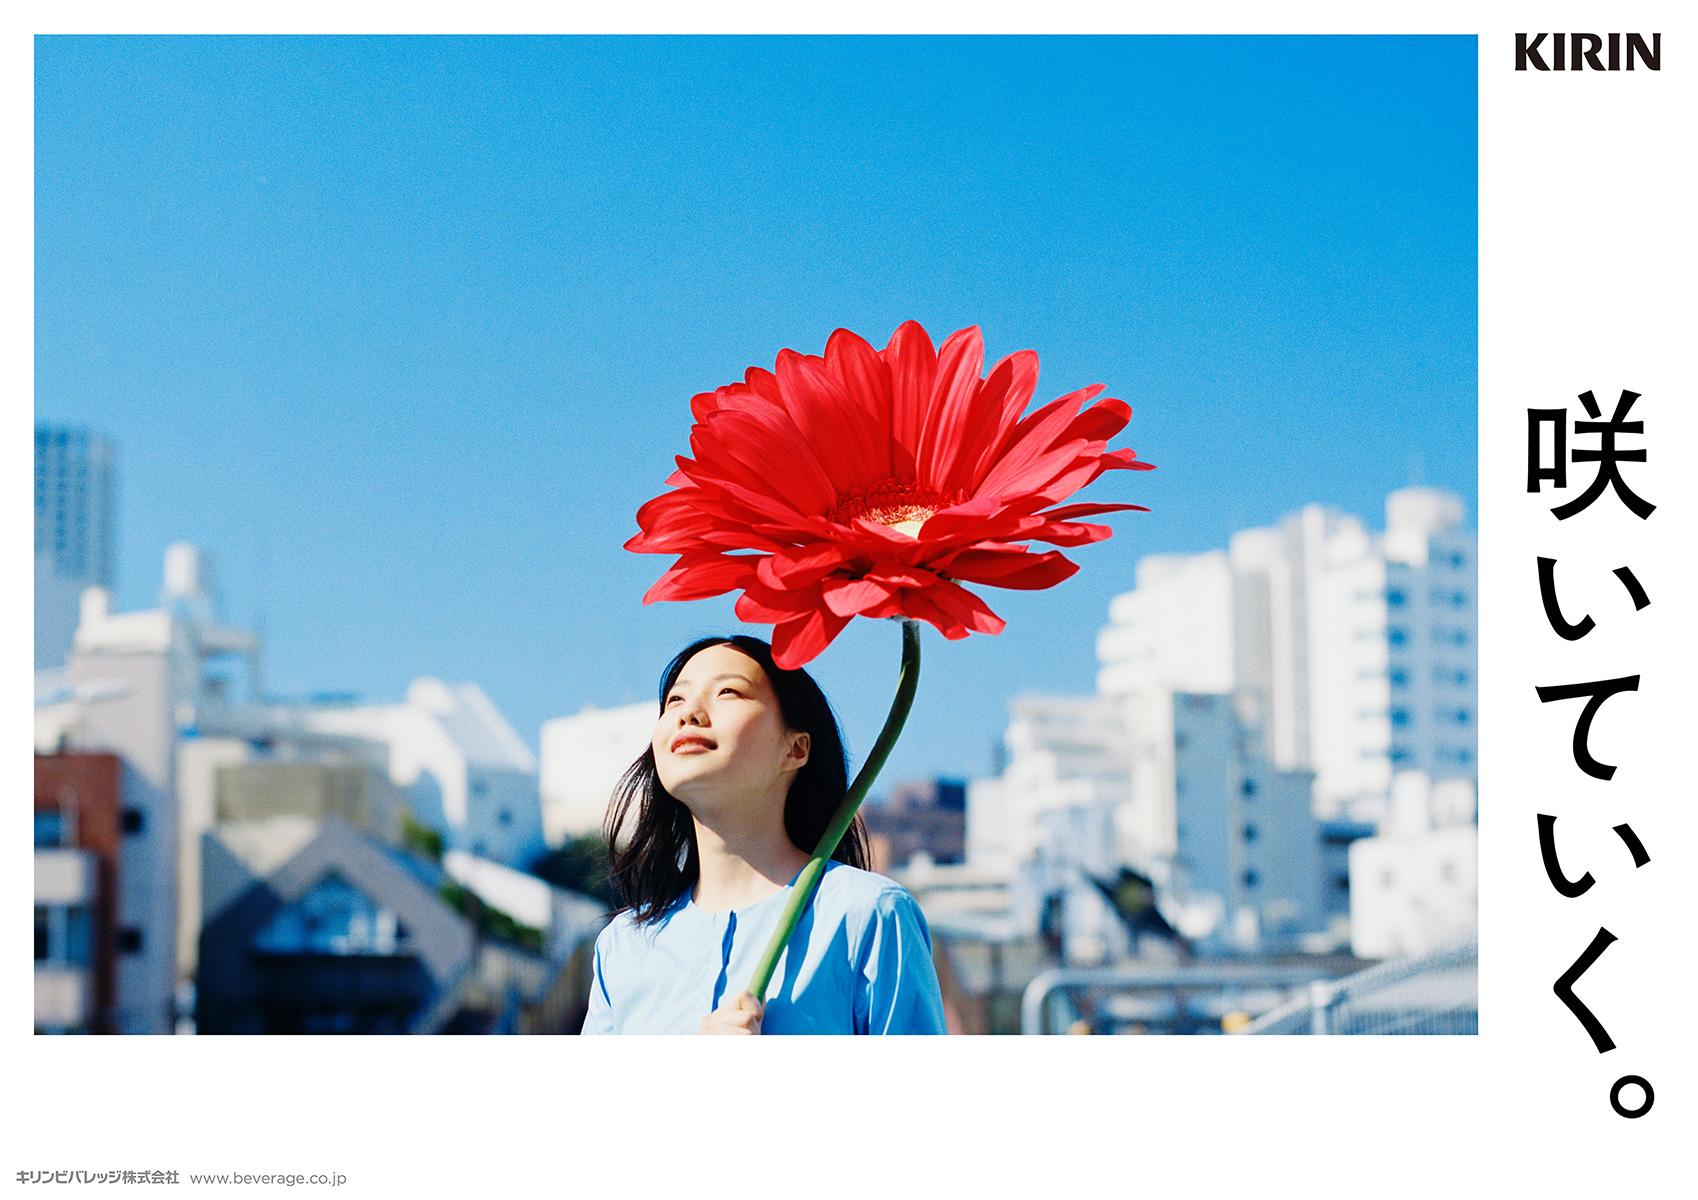 Ů�藤 Á�やの Ayano Ando Model Agency Friday